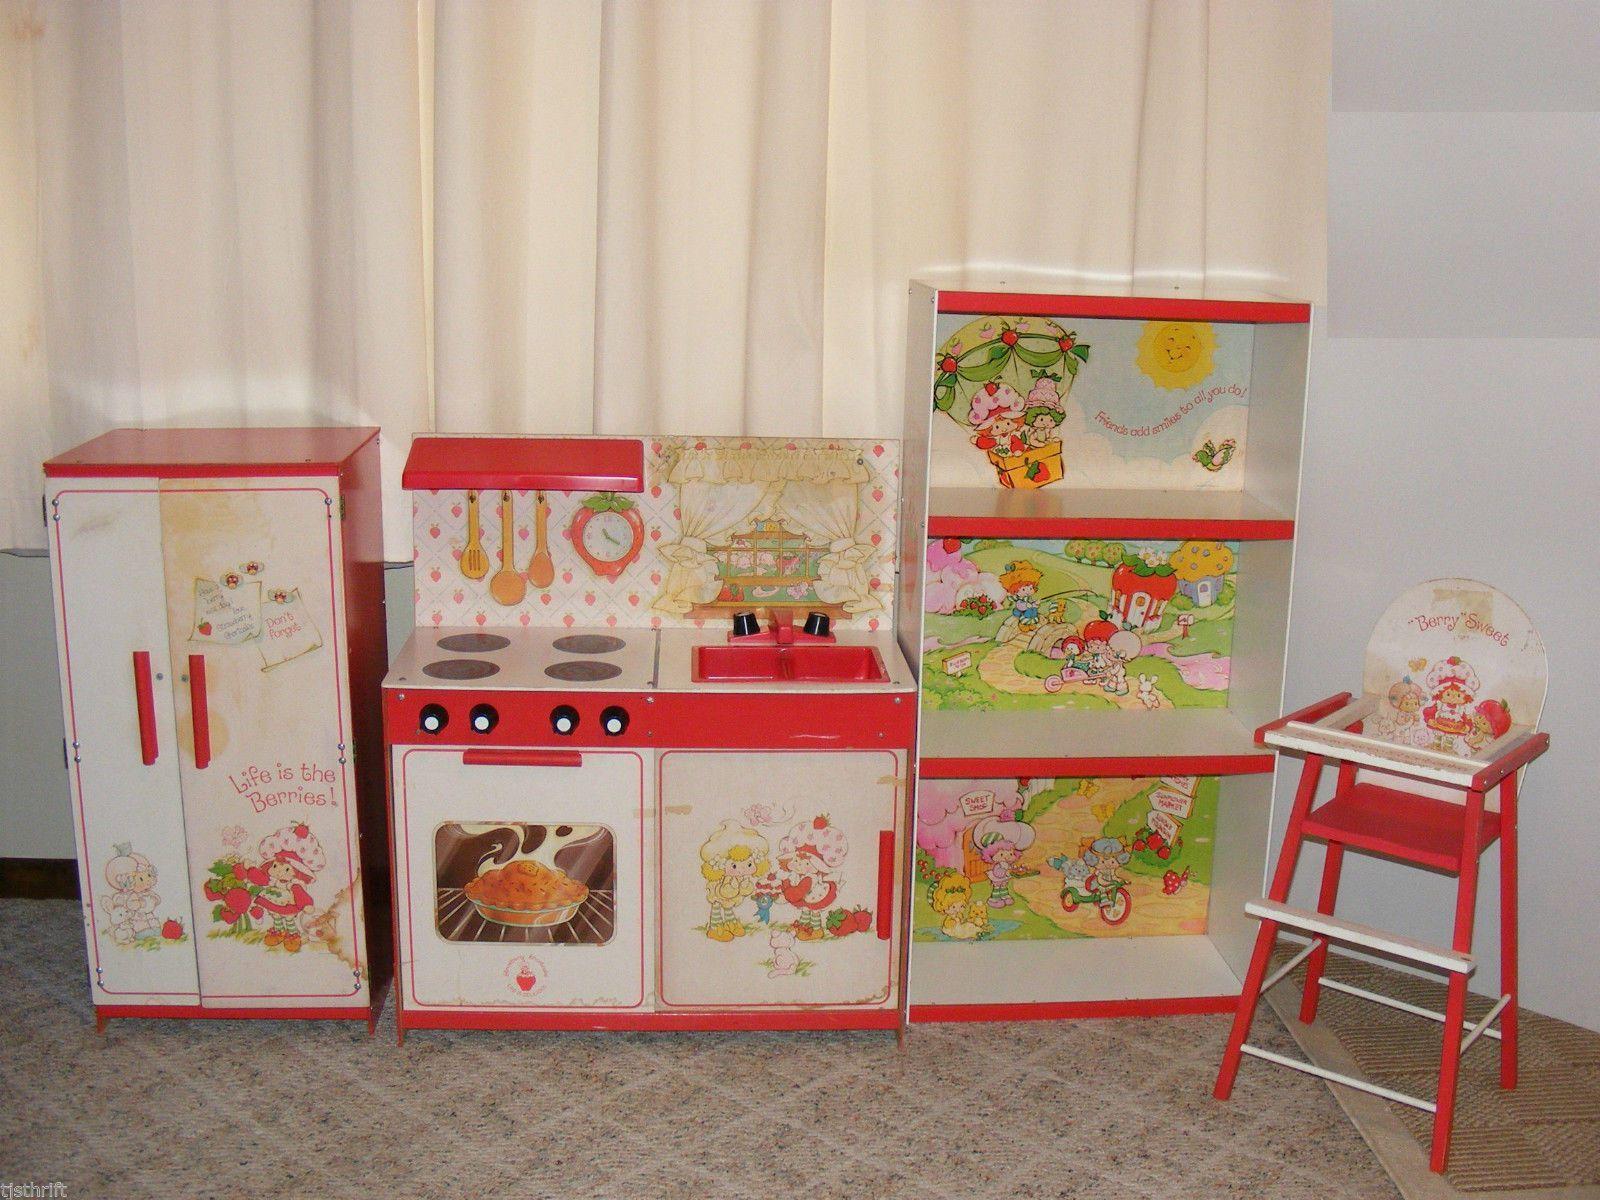 Strawberry Shortcake Vintage Kitchen Playset Dolls